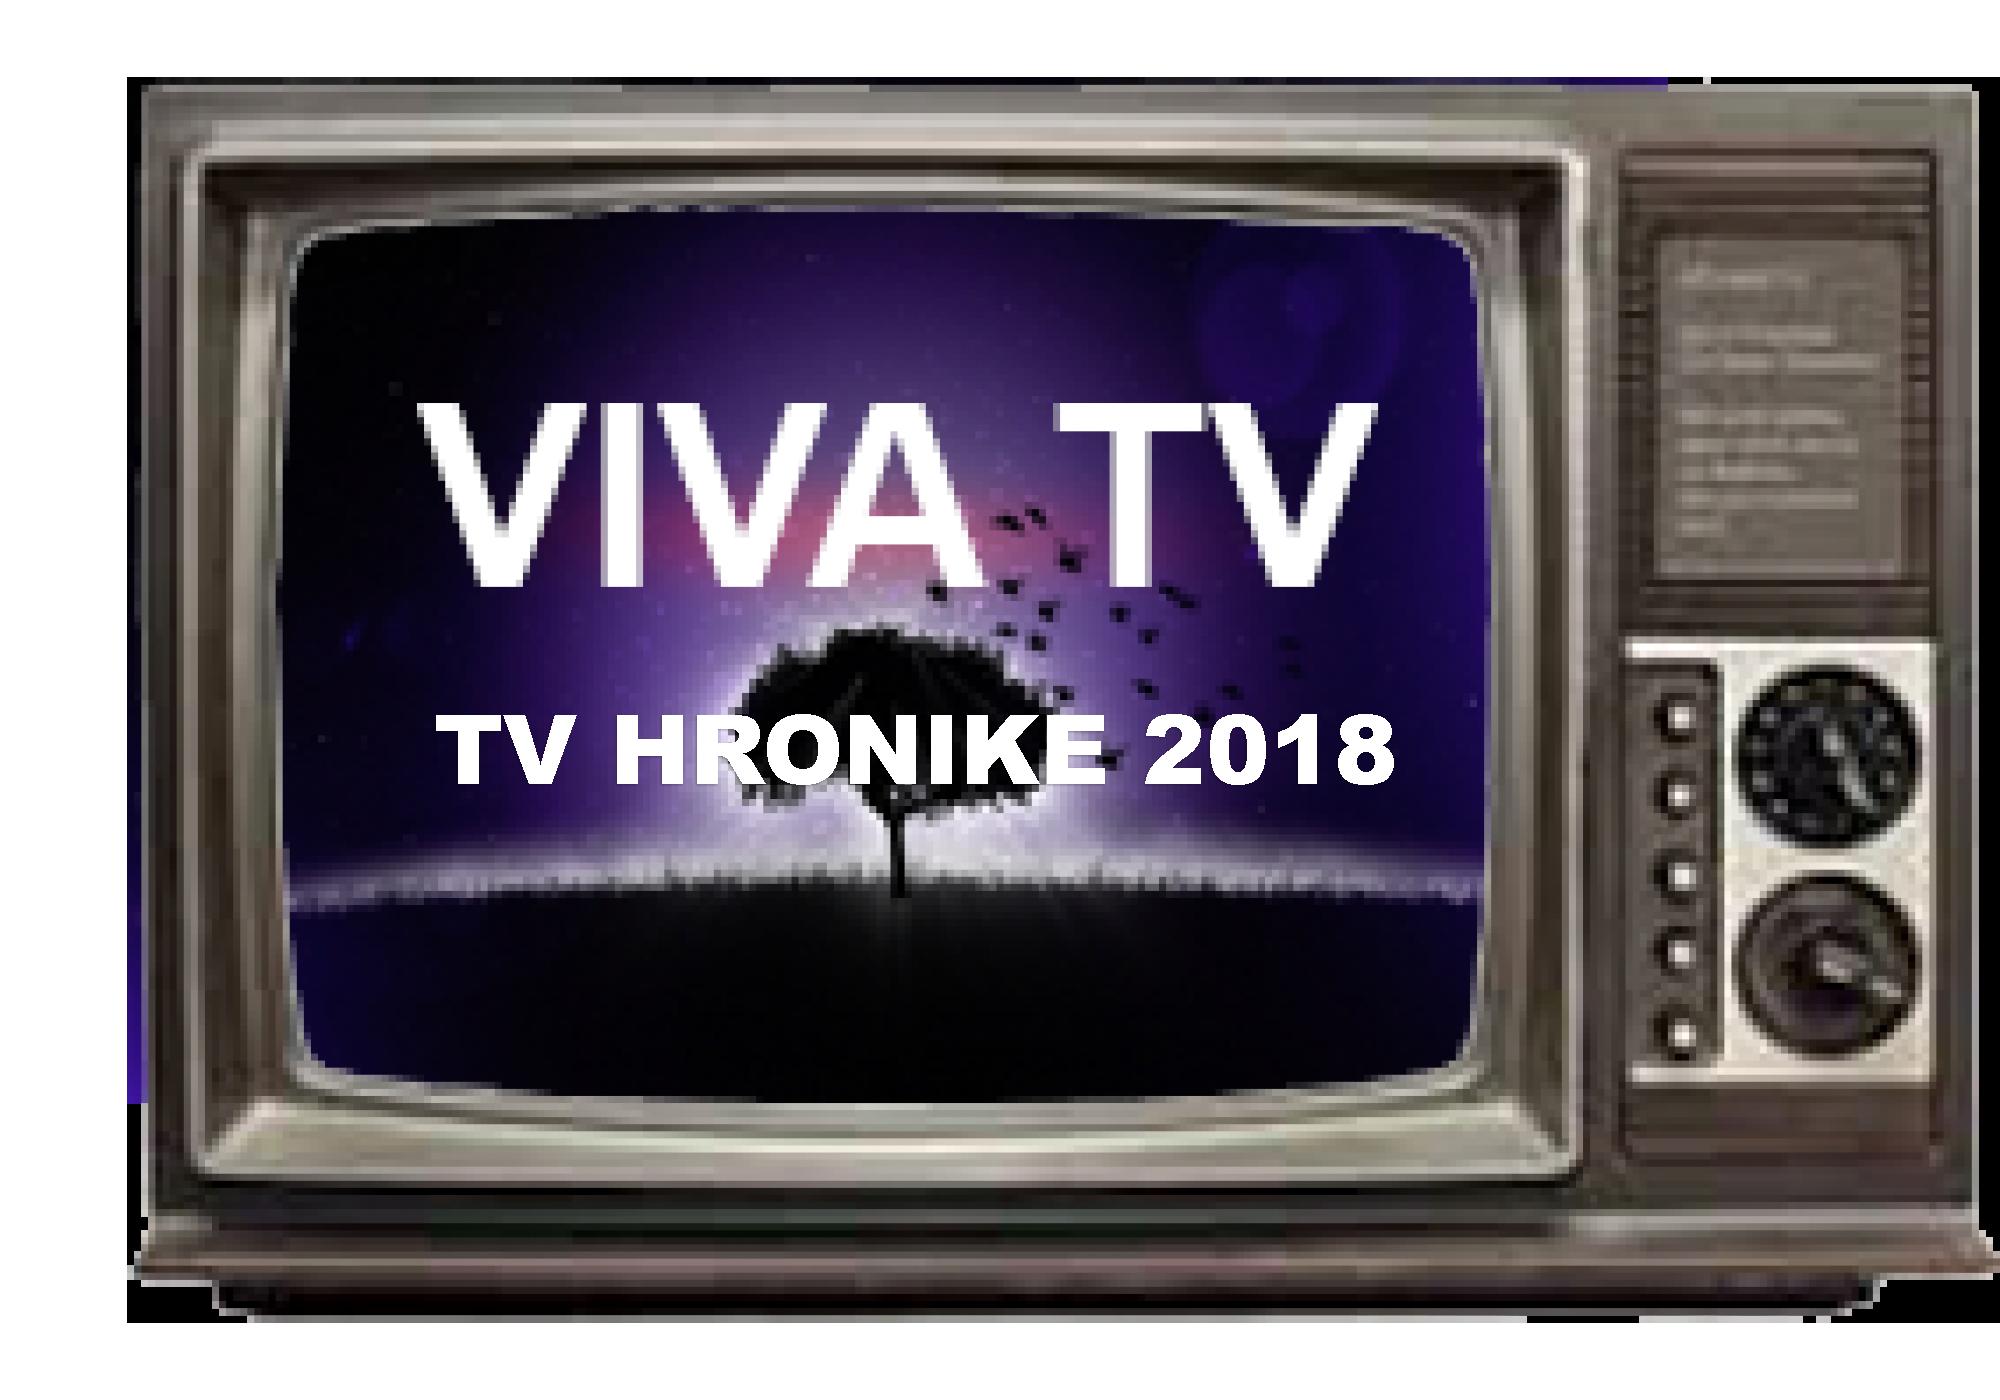 HRONIKE 2018